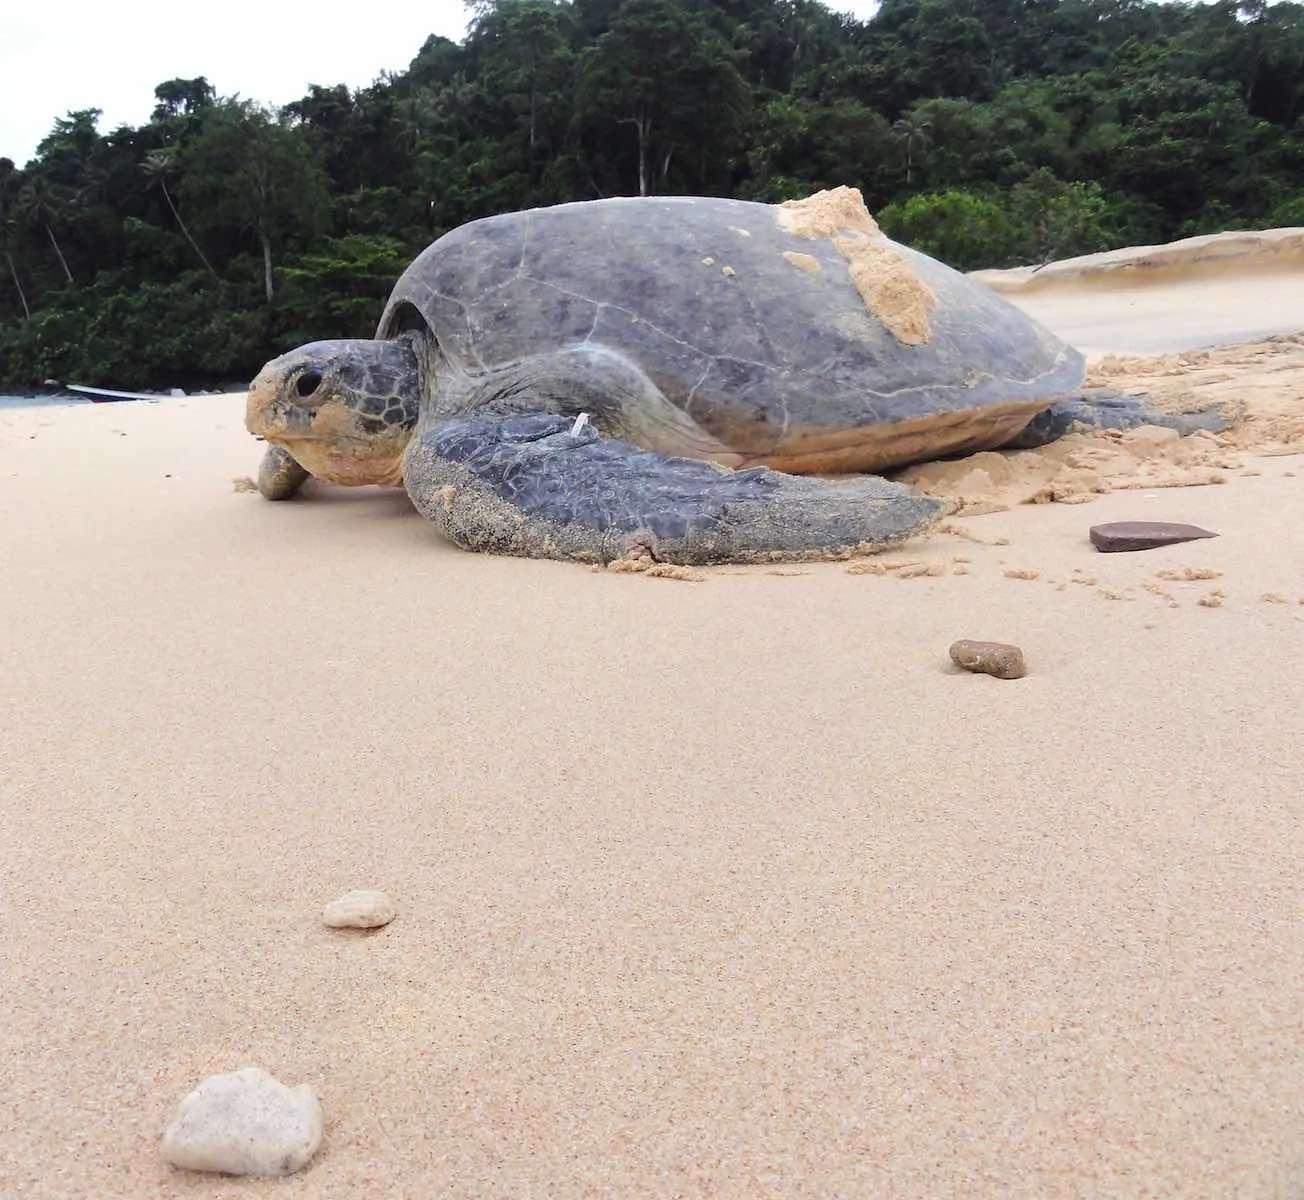 Turtle at Talang Besar Island, Sarawak